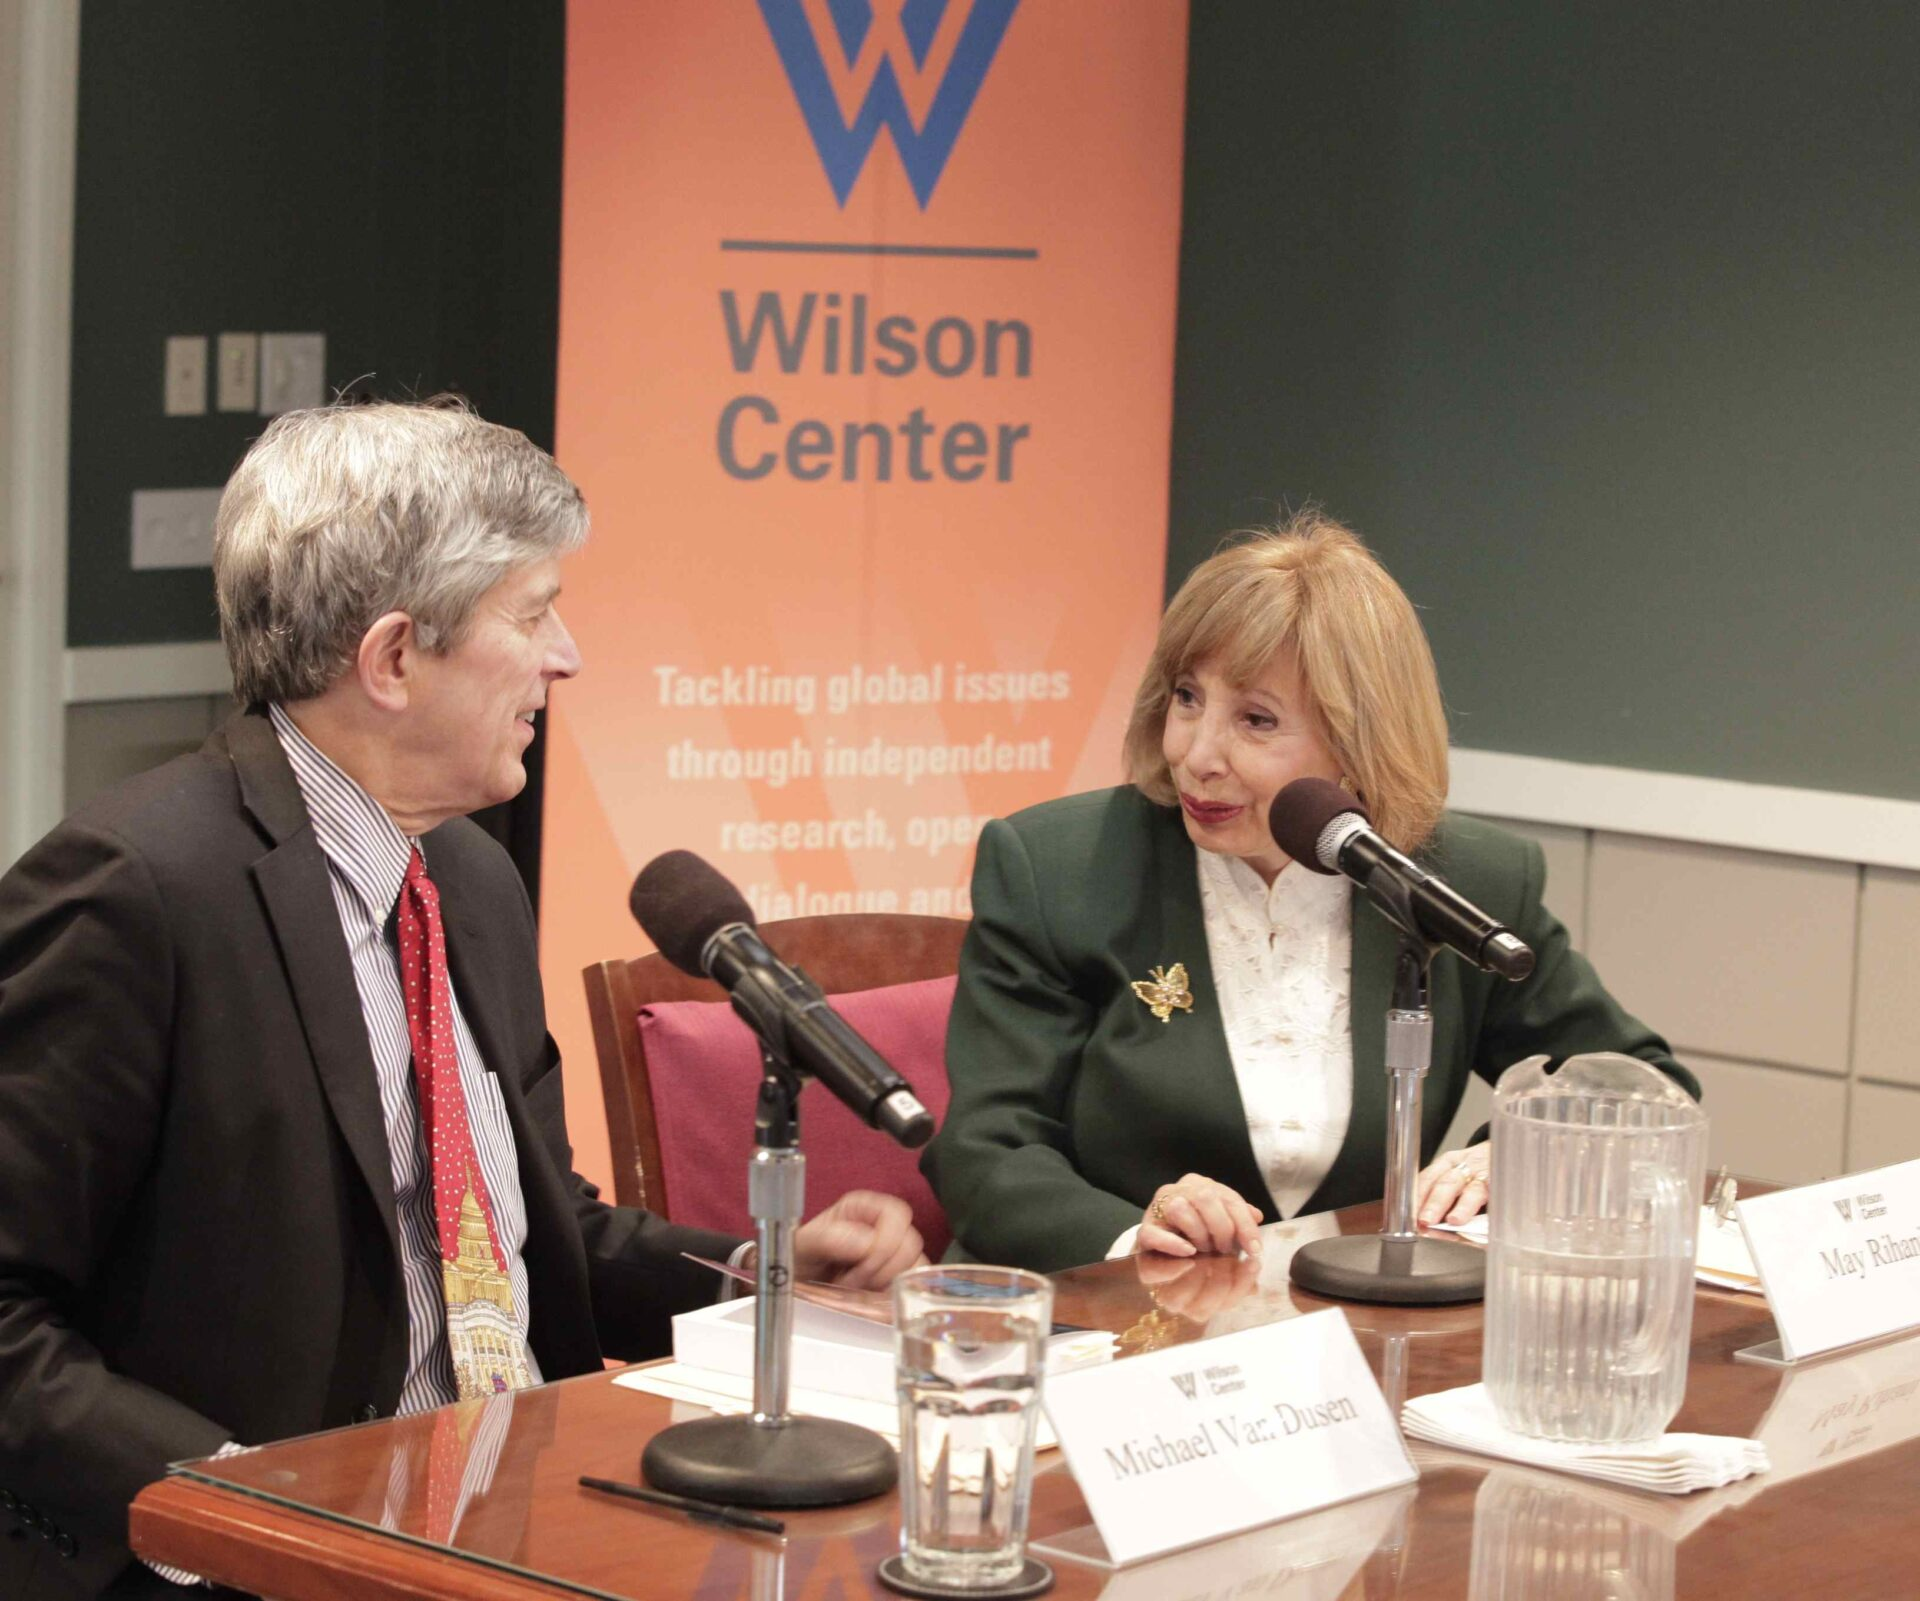 Dr. Michael Van Dusen, former Executive VP and current Senior Advisor at the Center, introduced May Rihani